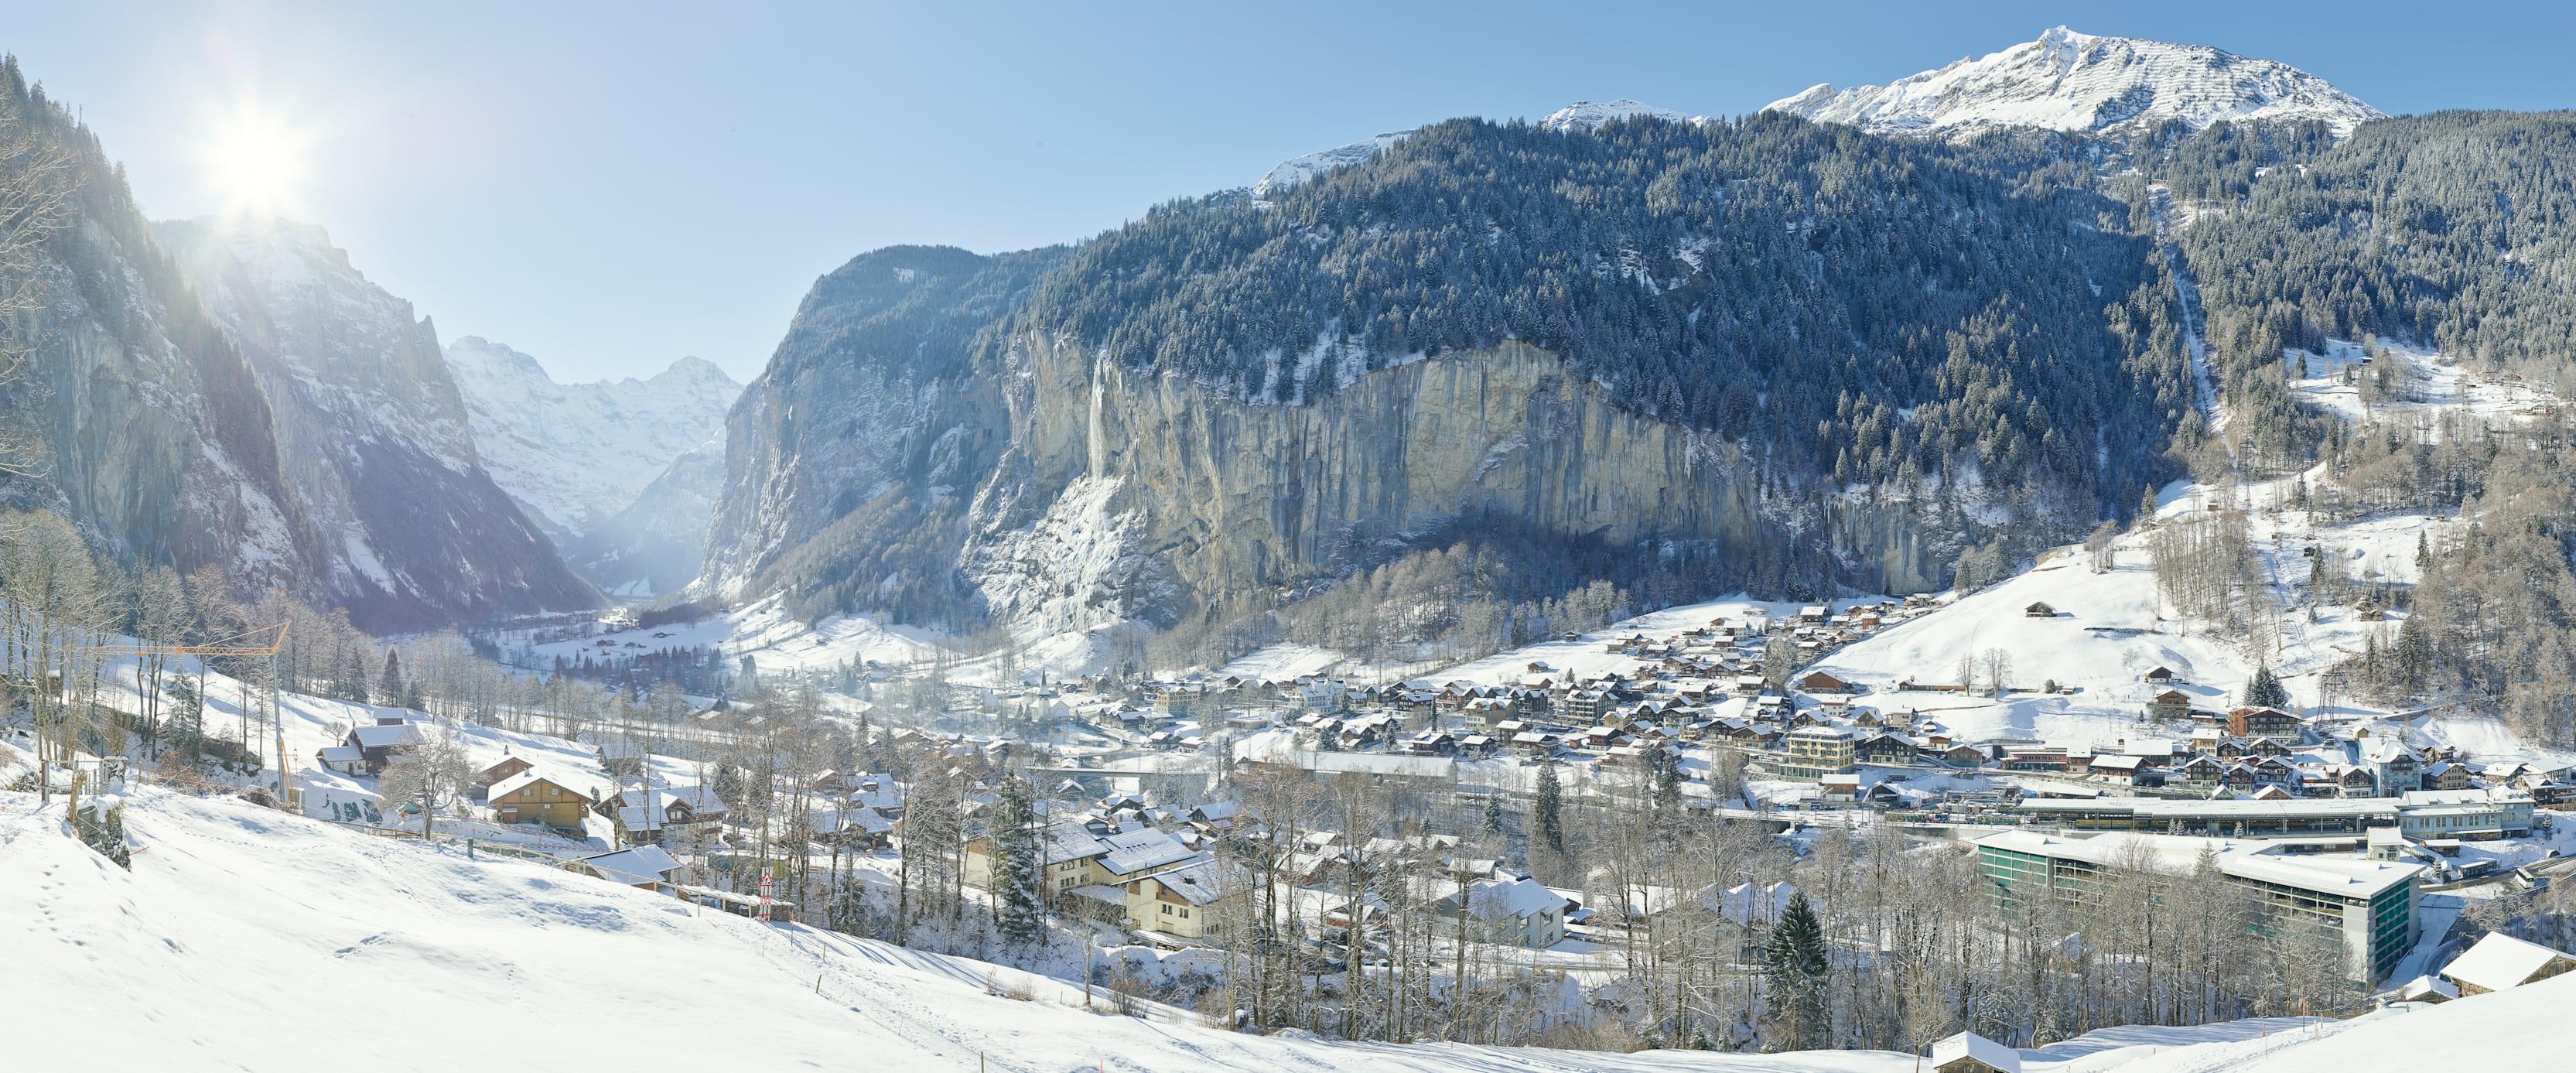 Lauterbrunnen Winter Staubbachfall Panorama